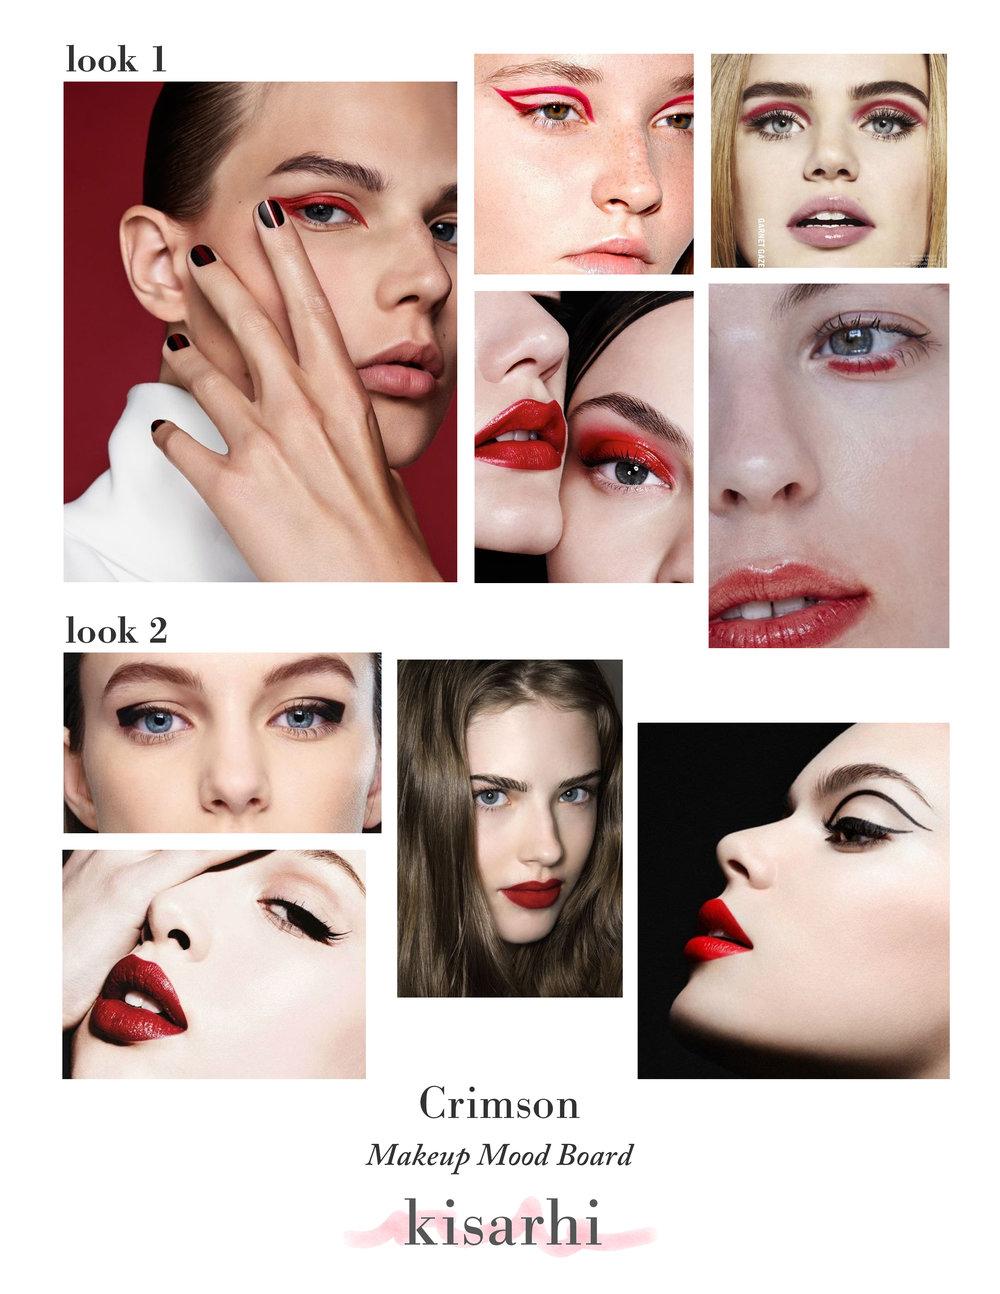 MoodBoard_Crimson_Makeup.jpg